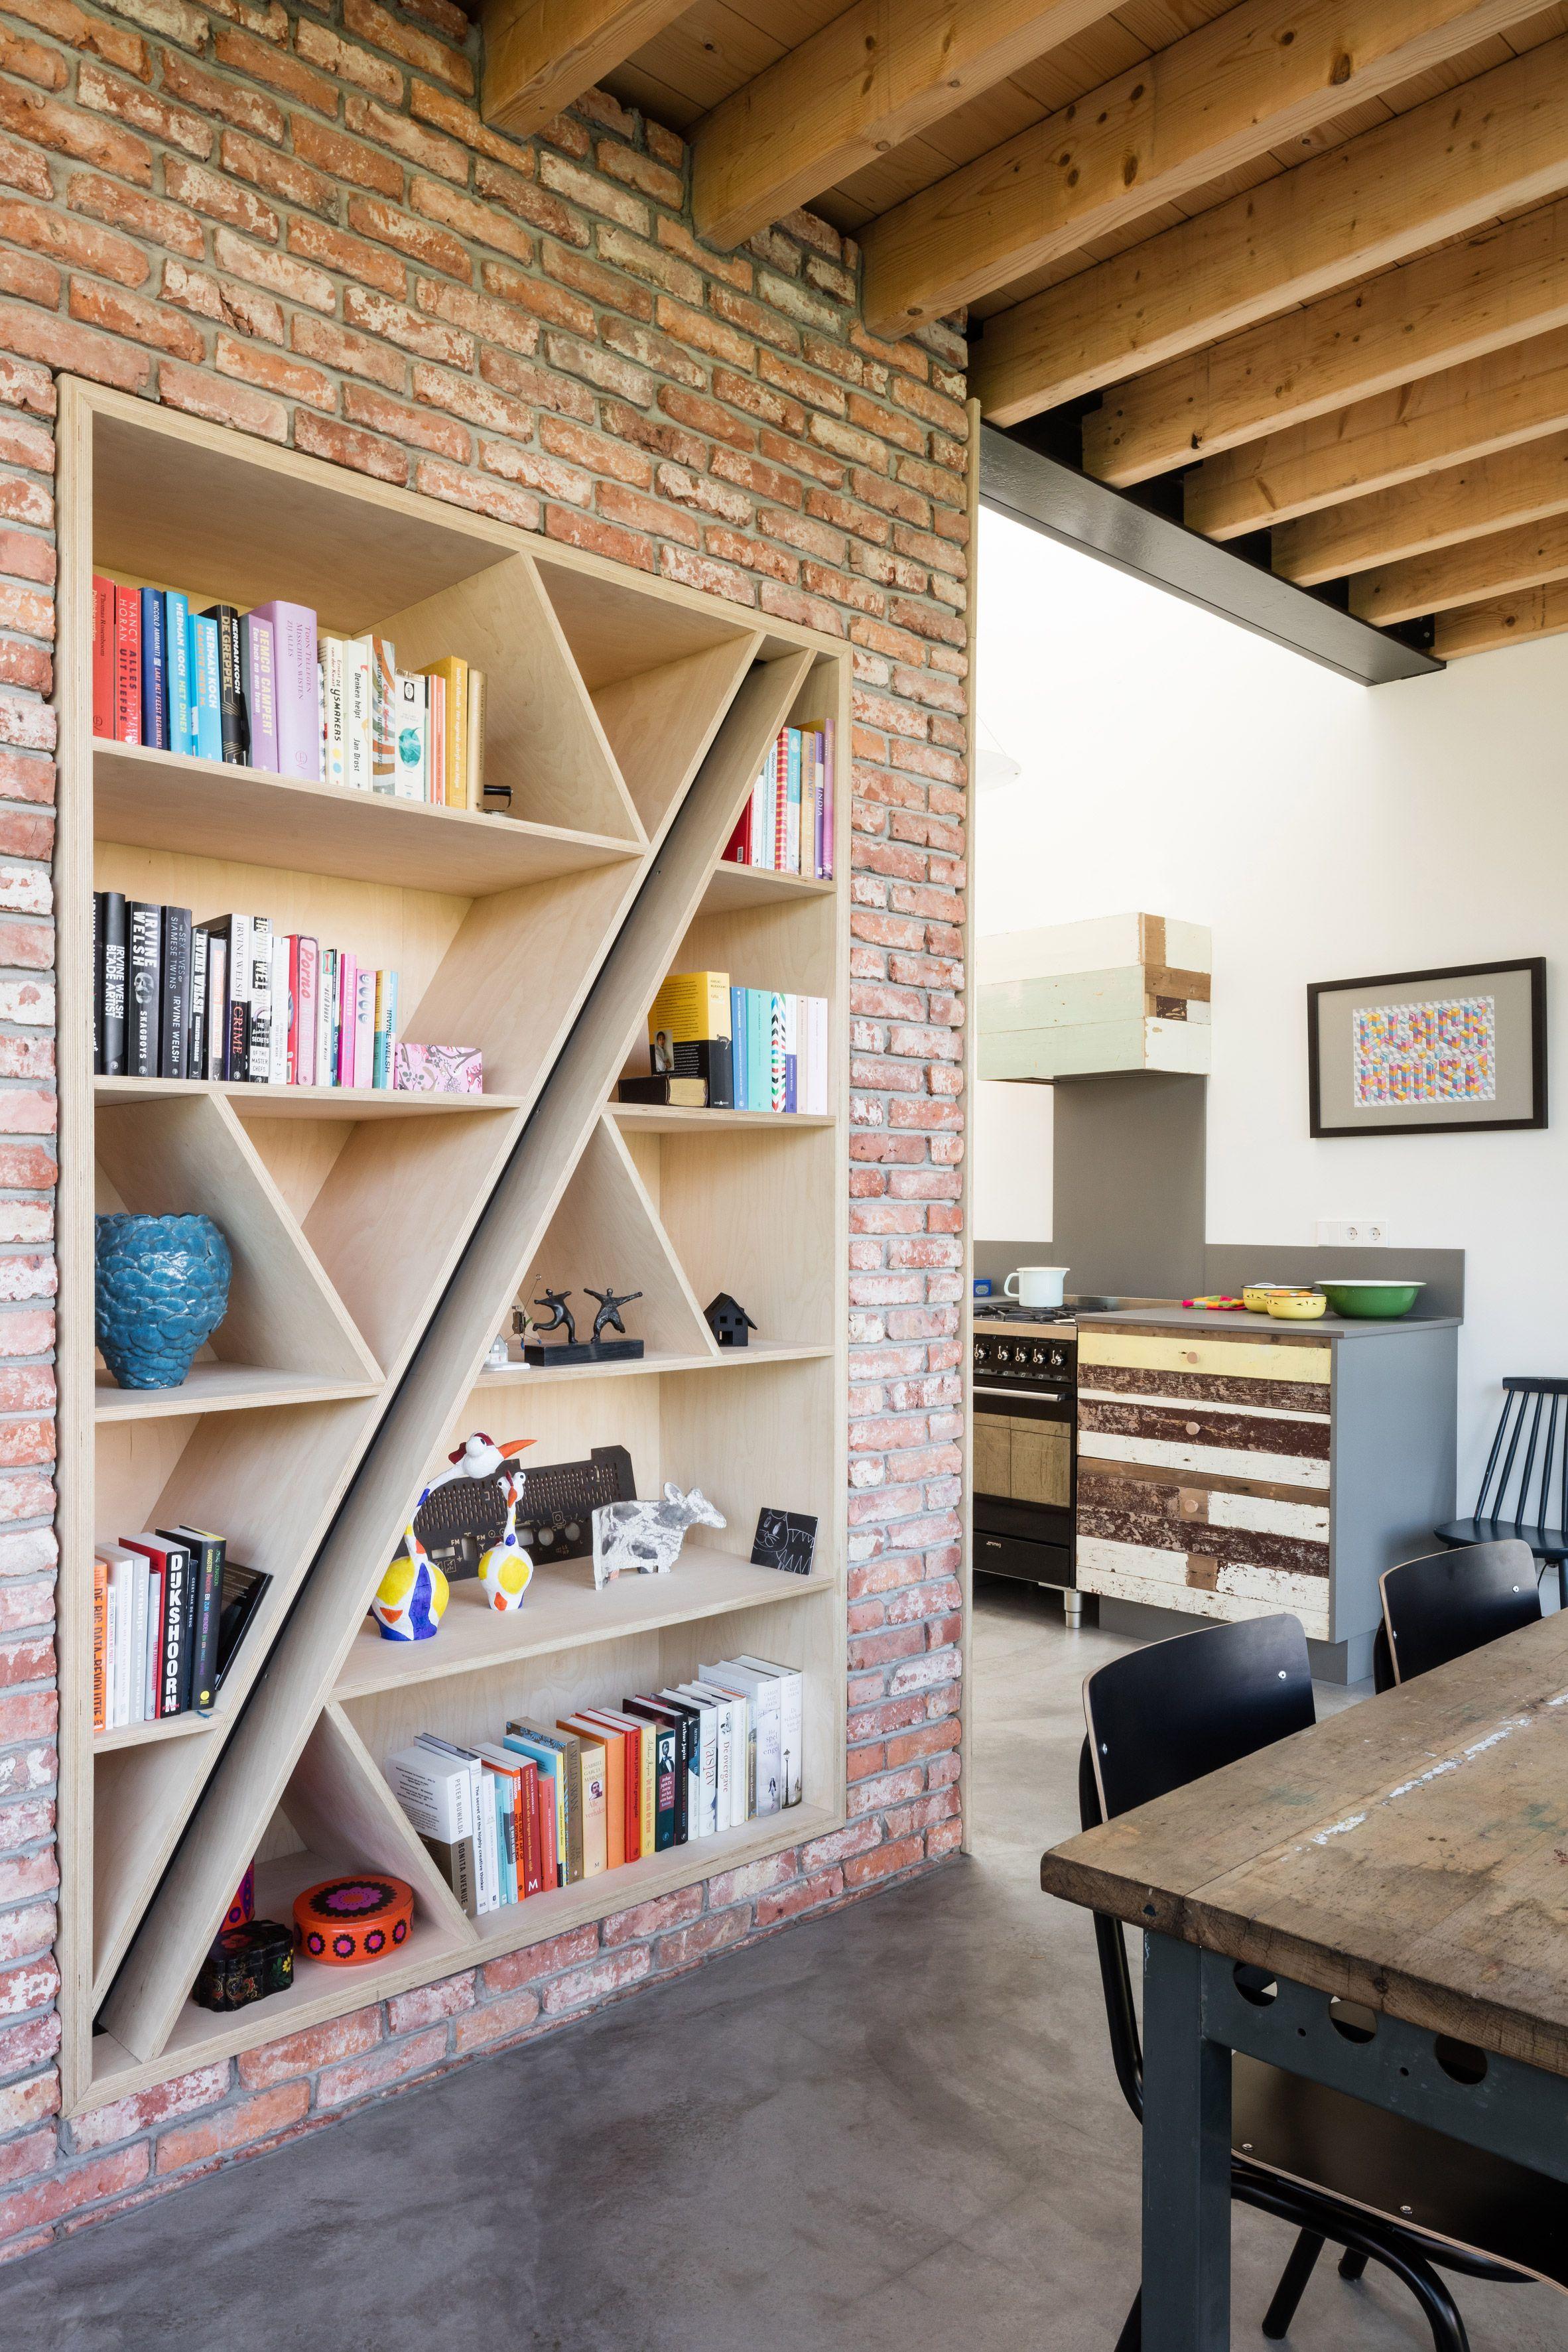 Pin von Galofteanu Doina auf Ideas for the House | Pinterest ...